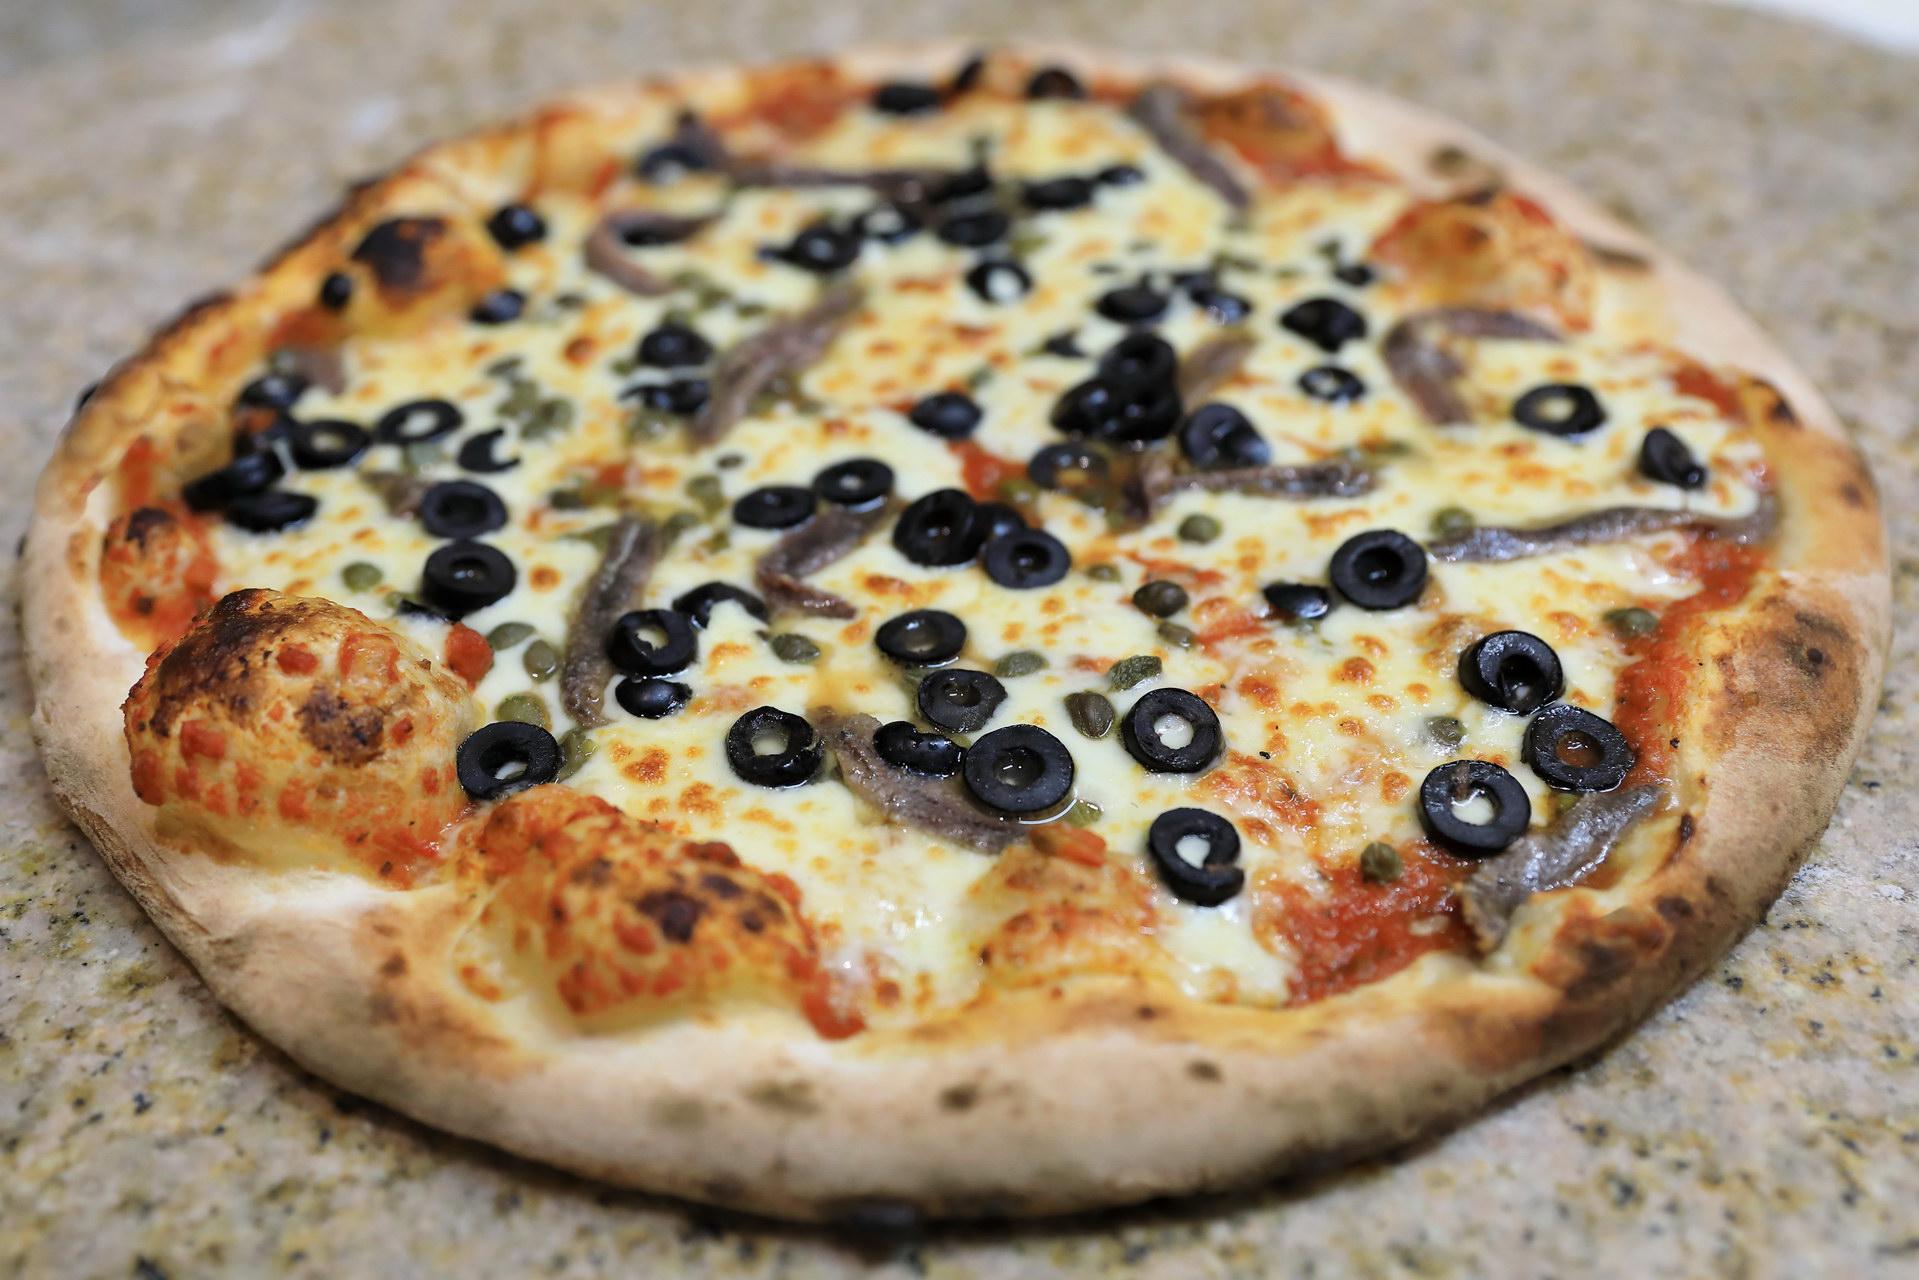 Le-Mediterraneen-Pizza-Braine-l-Alleud-0061.jpg